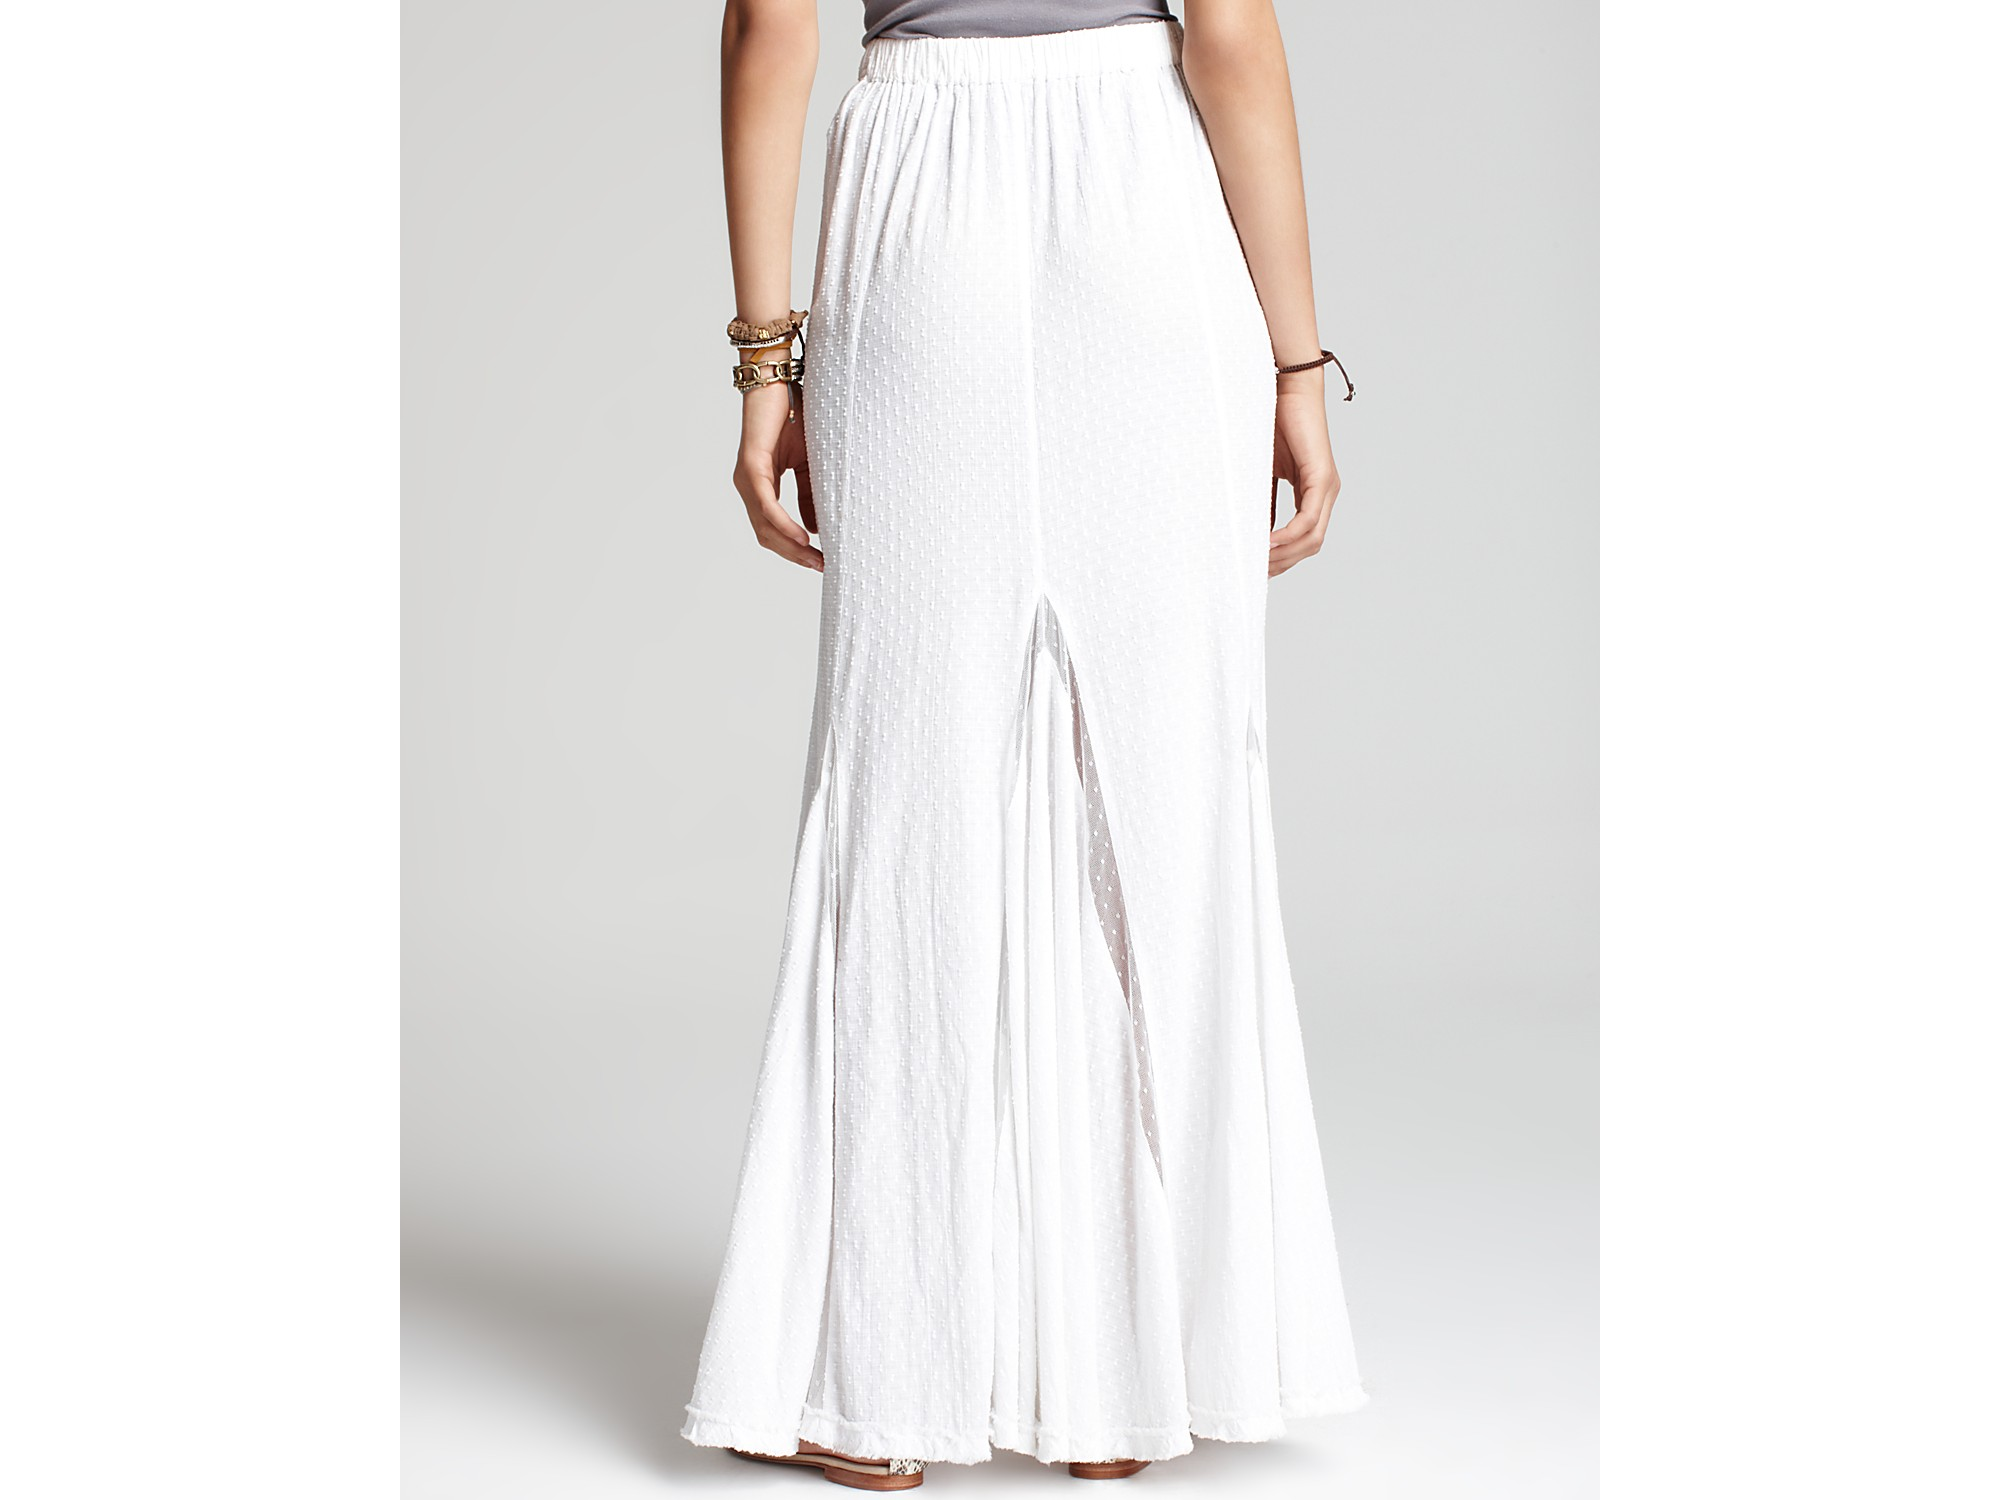 39518f8165 Free People Morning Glory Godet Skirt in White - Lyst